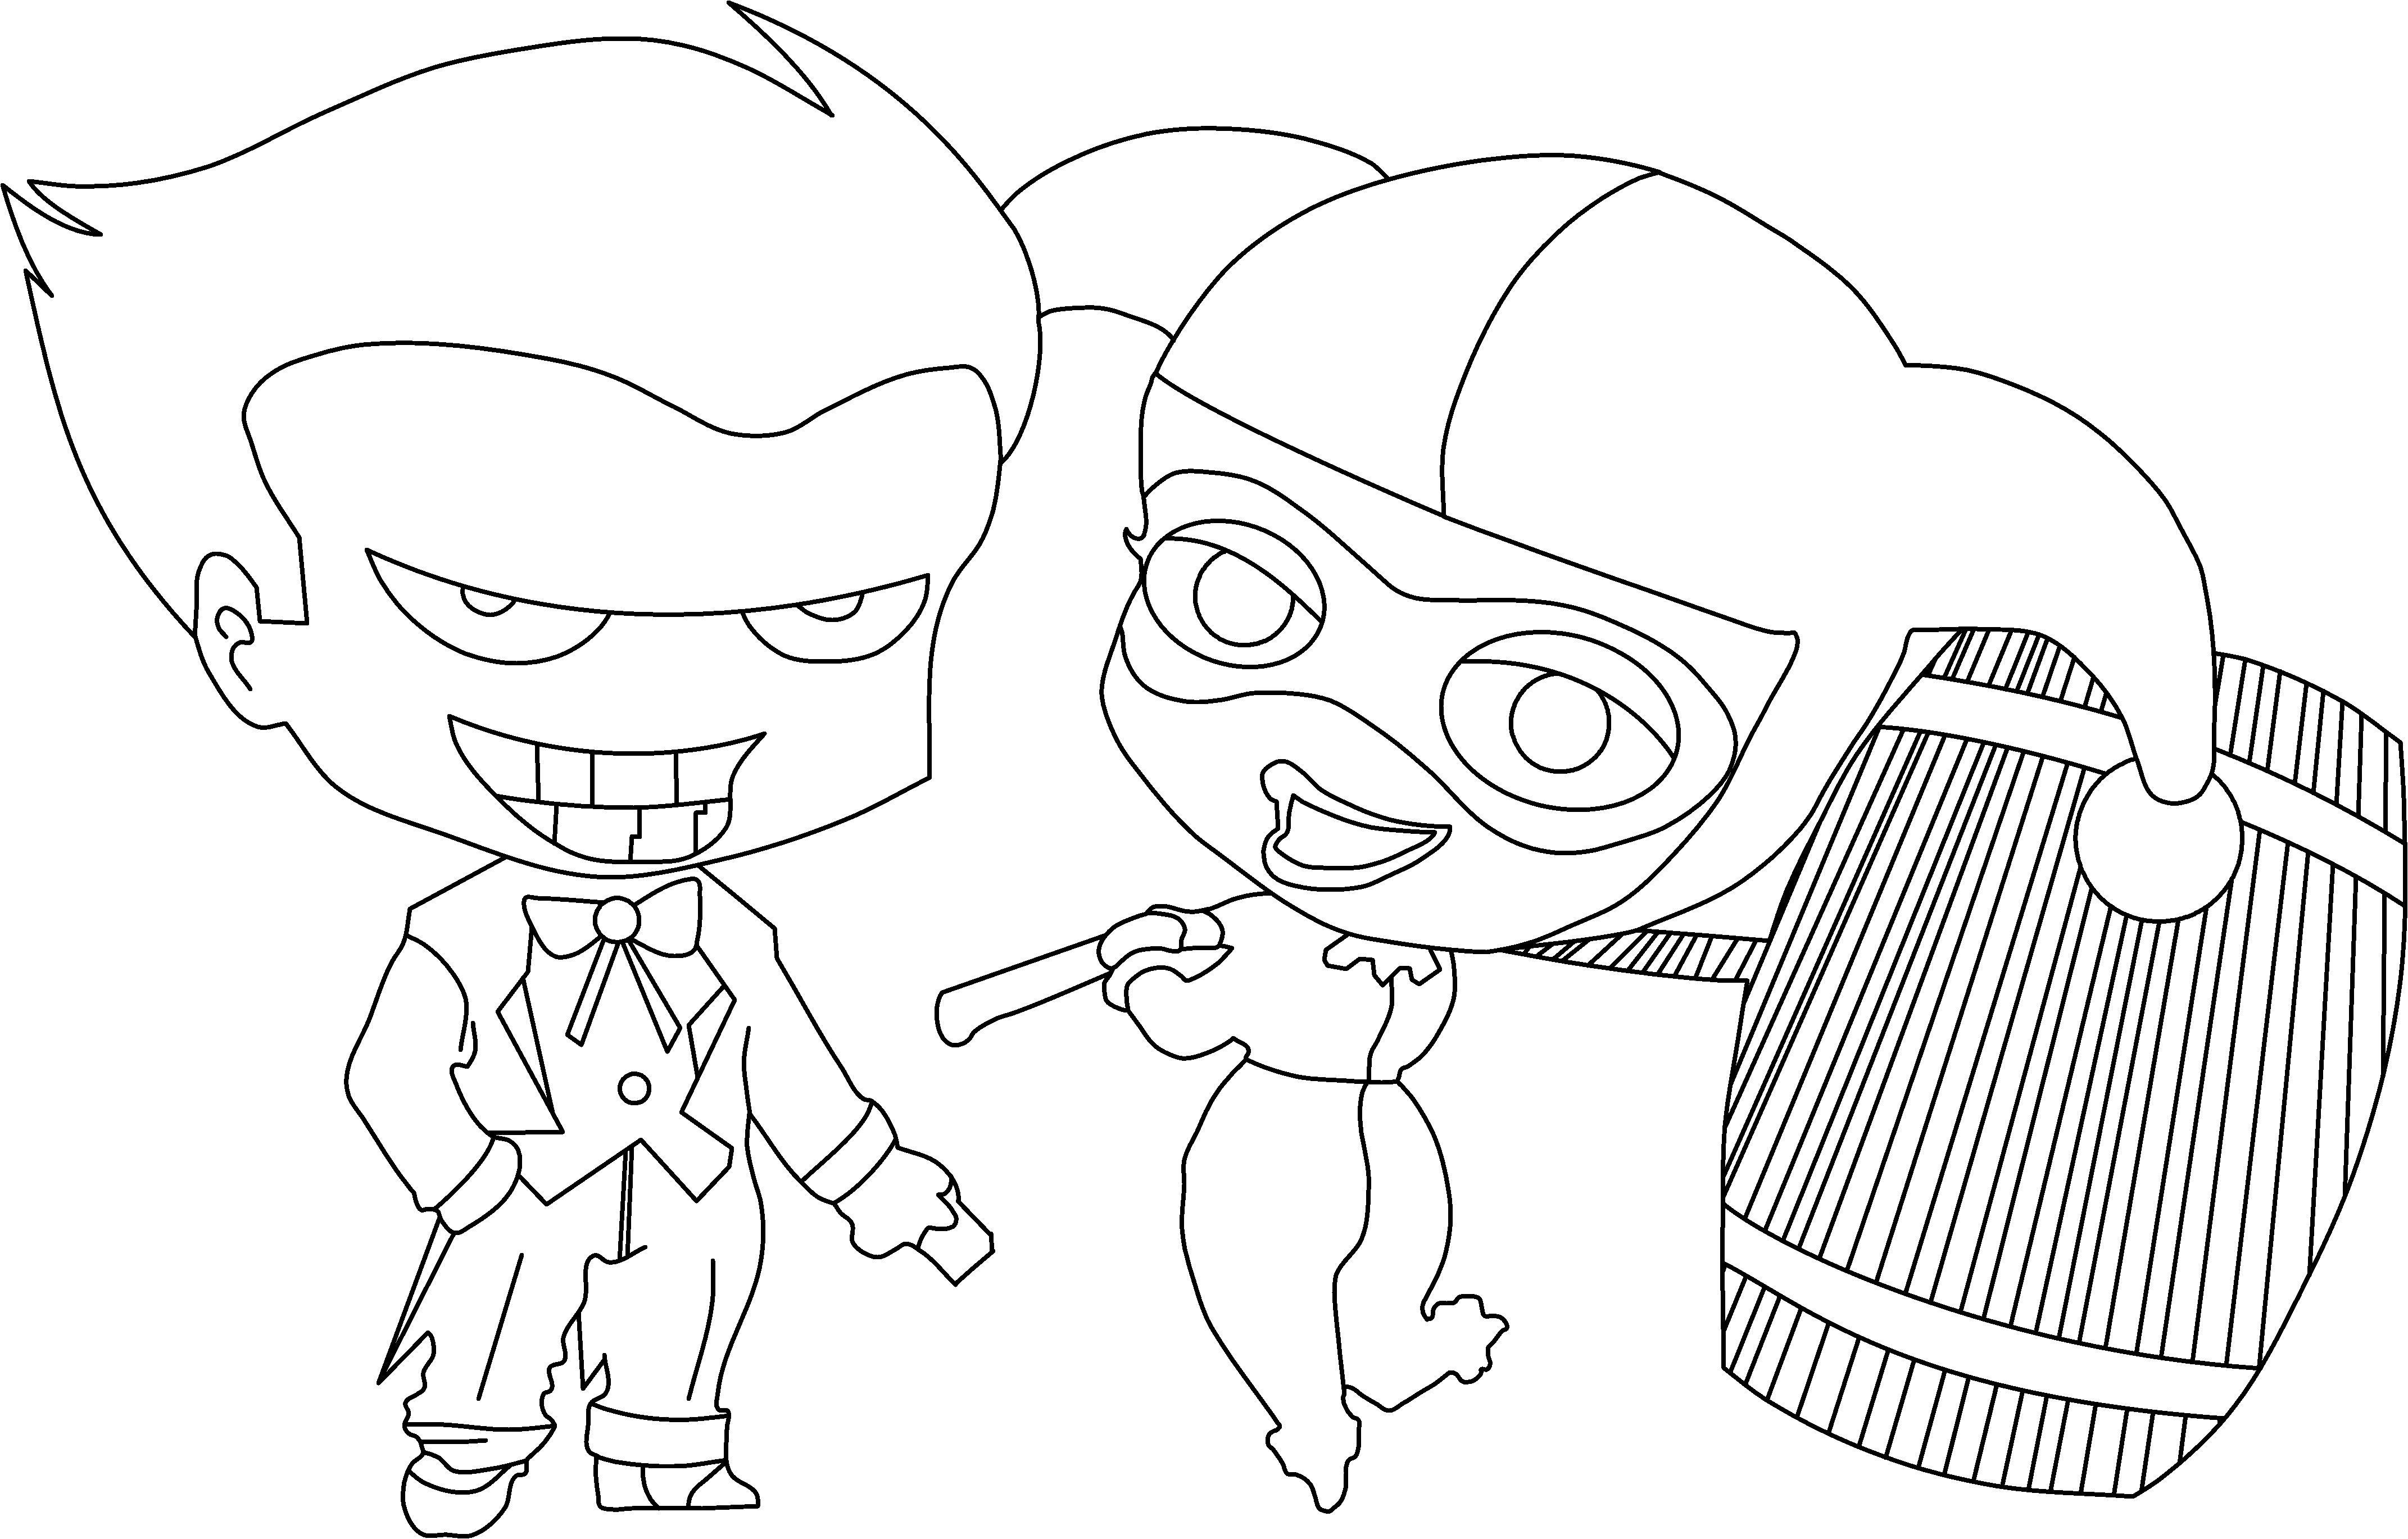 4285x2739 Joker Coloring Pages Coloringsuite Com Ribsvigyapan Joker Joker